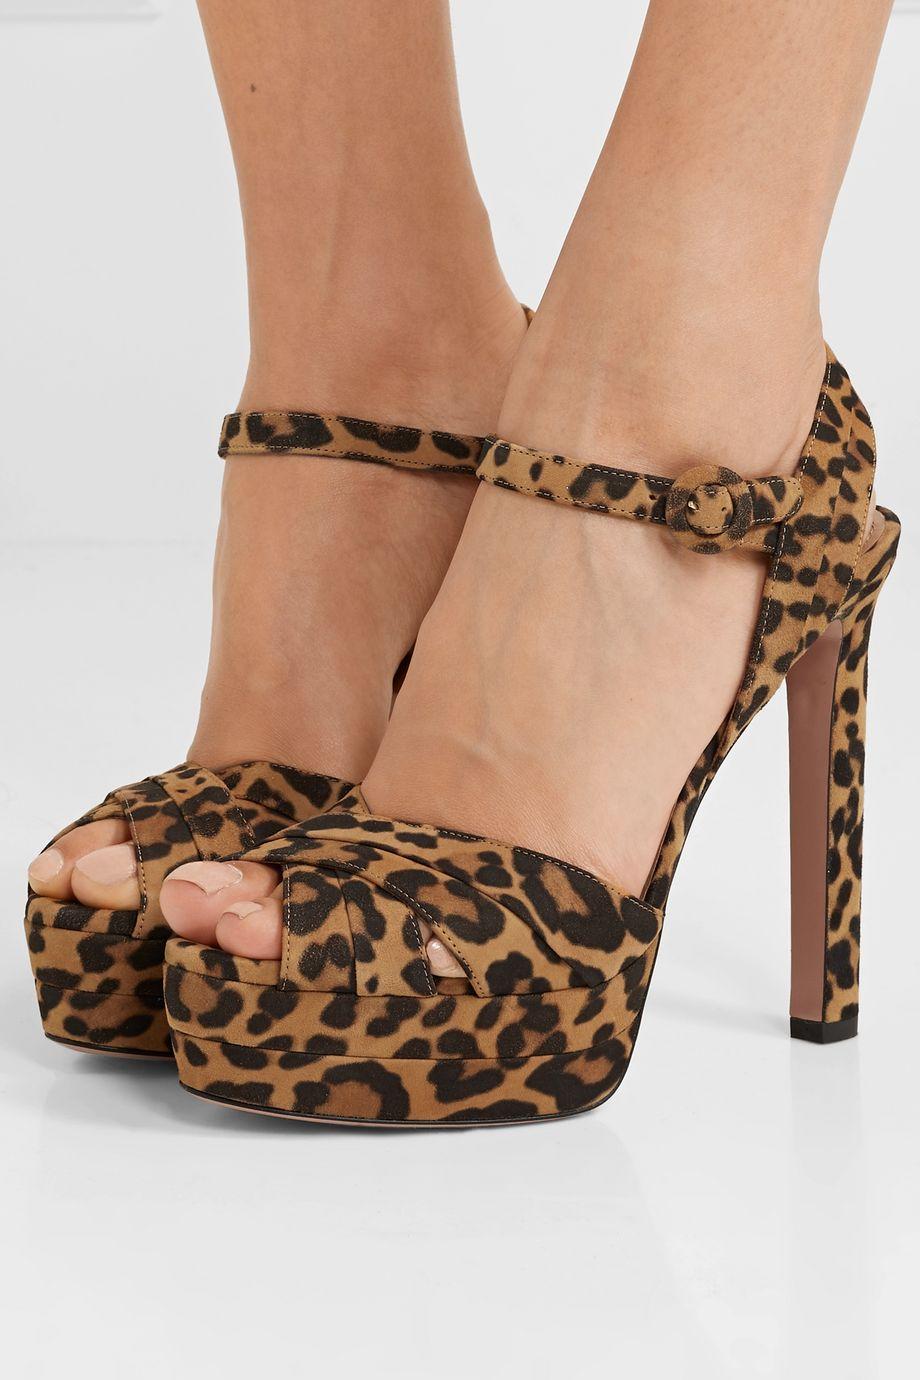 Aquazzura Coquette 140 leopard-print suede platform sandals